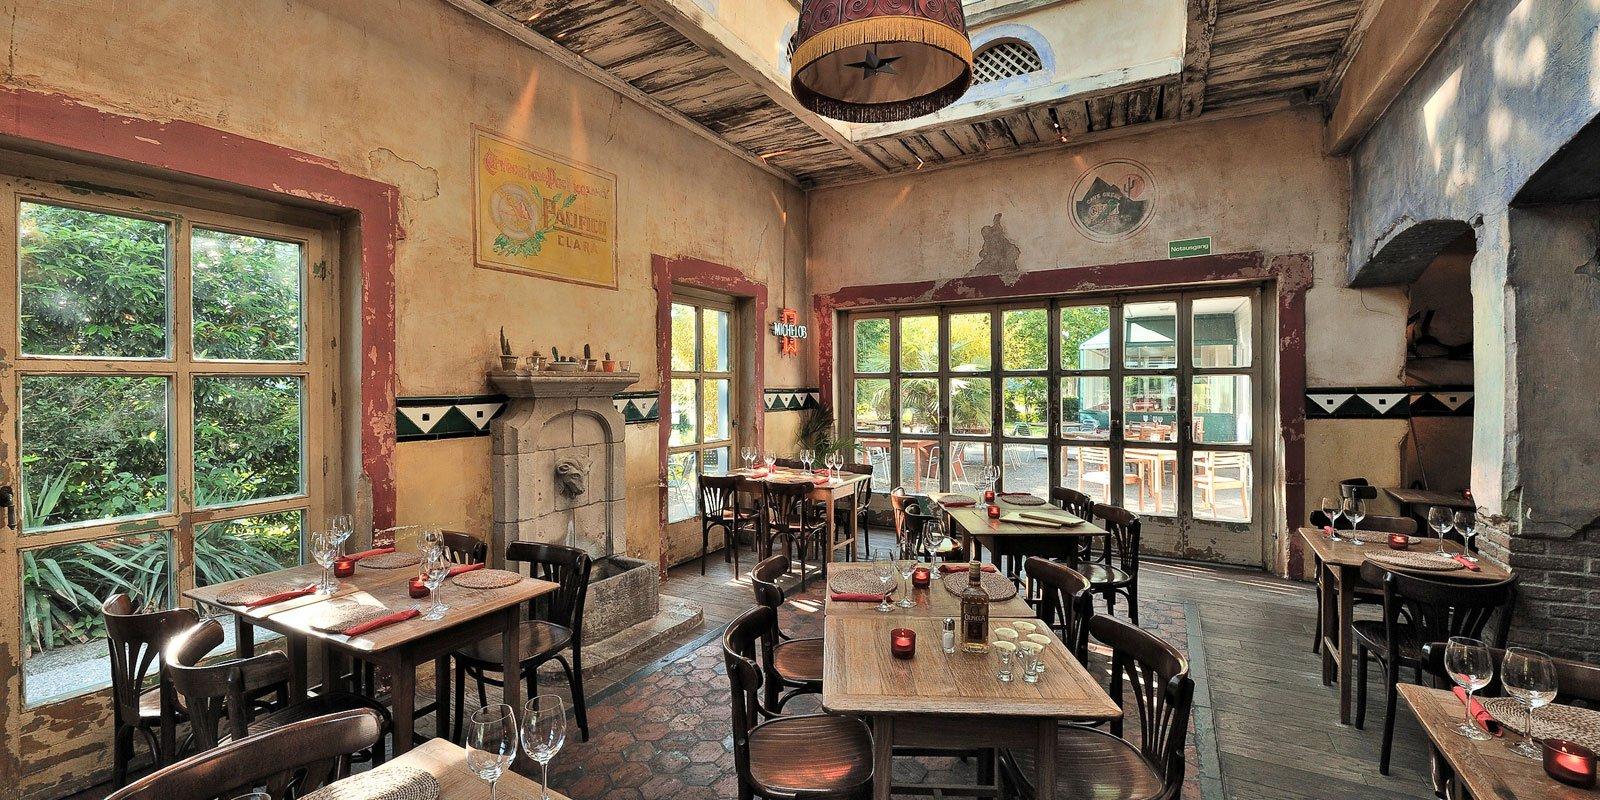 Martinshof Solothurn Zuchwil Restaurant La Cucaracha